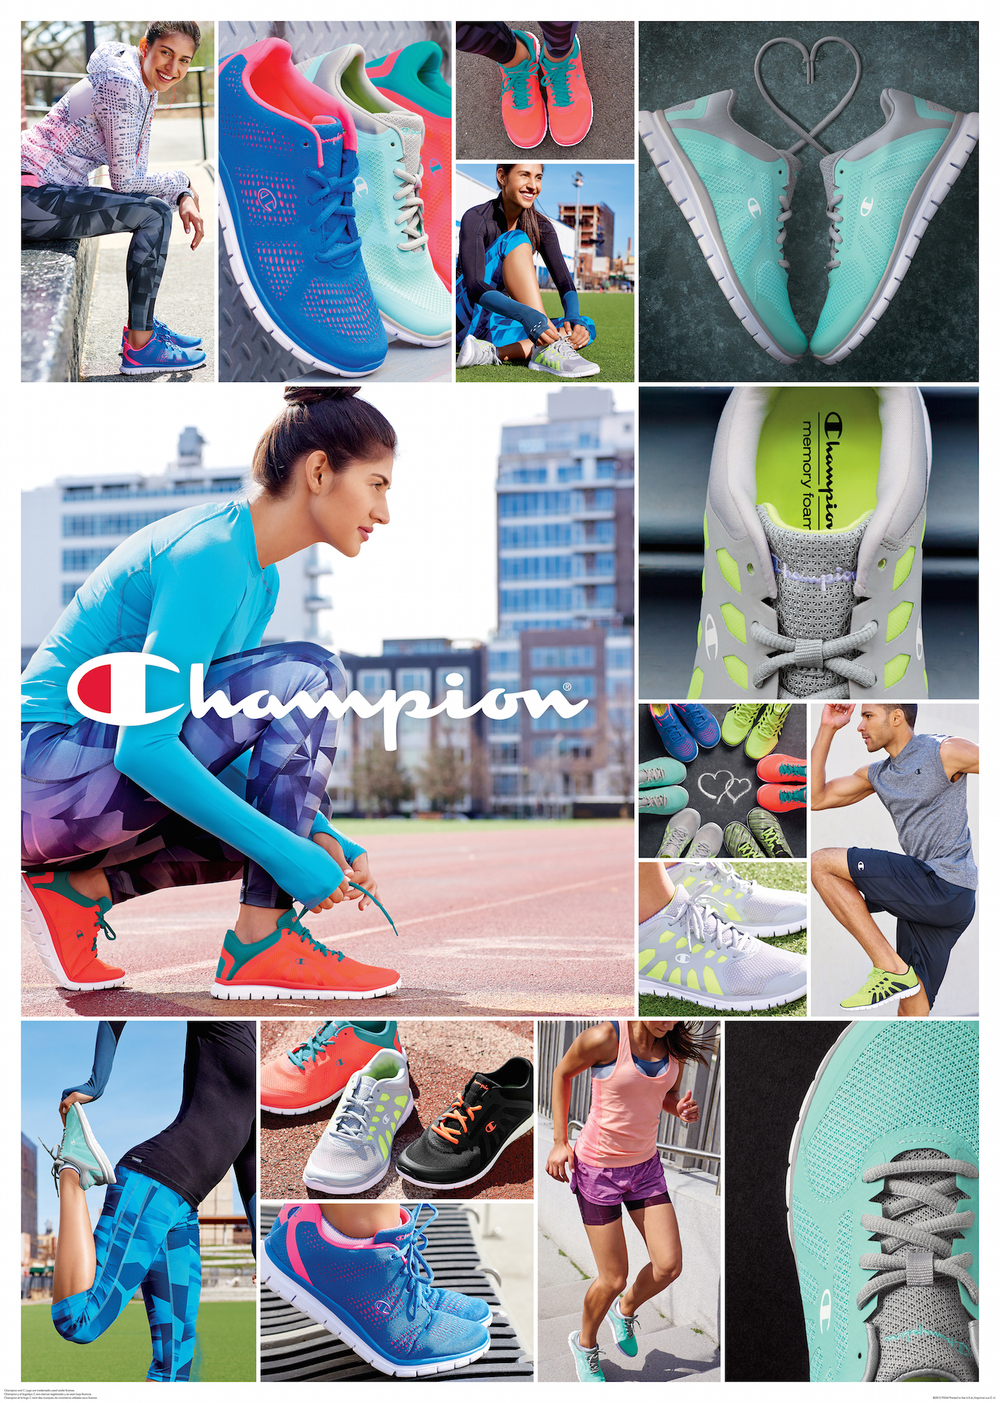 Payless Shoe Source / Champion